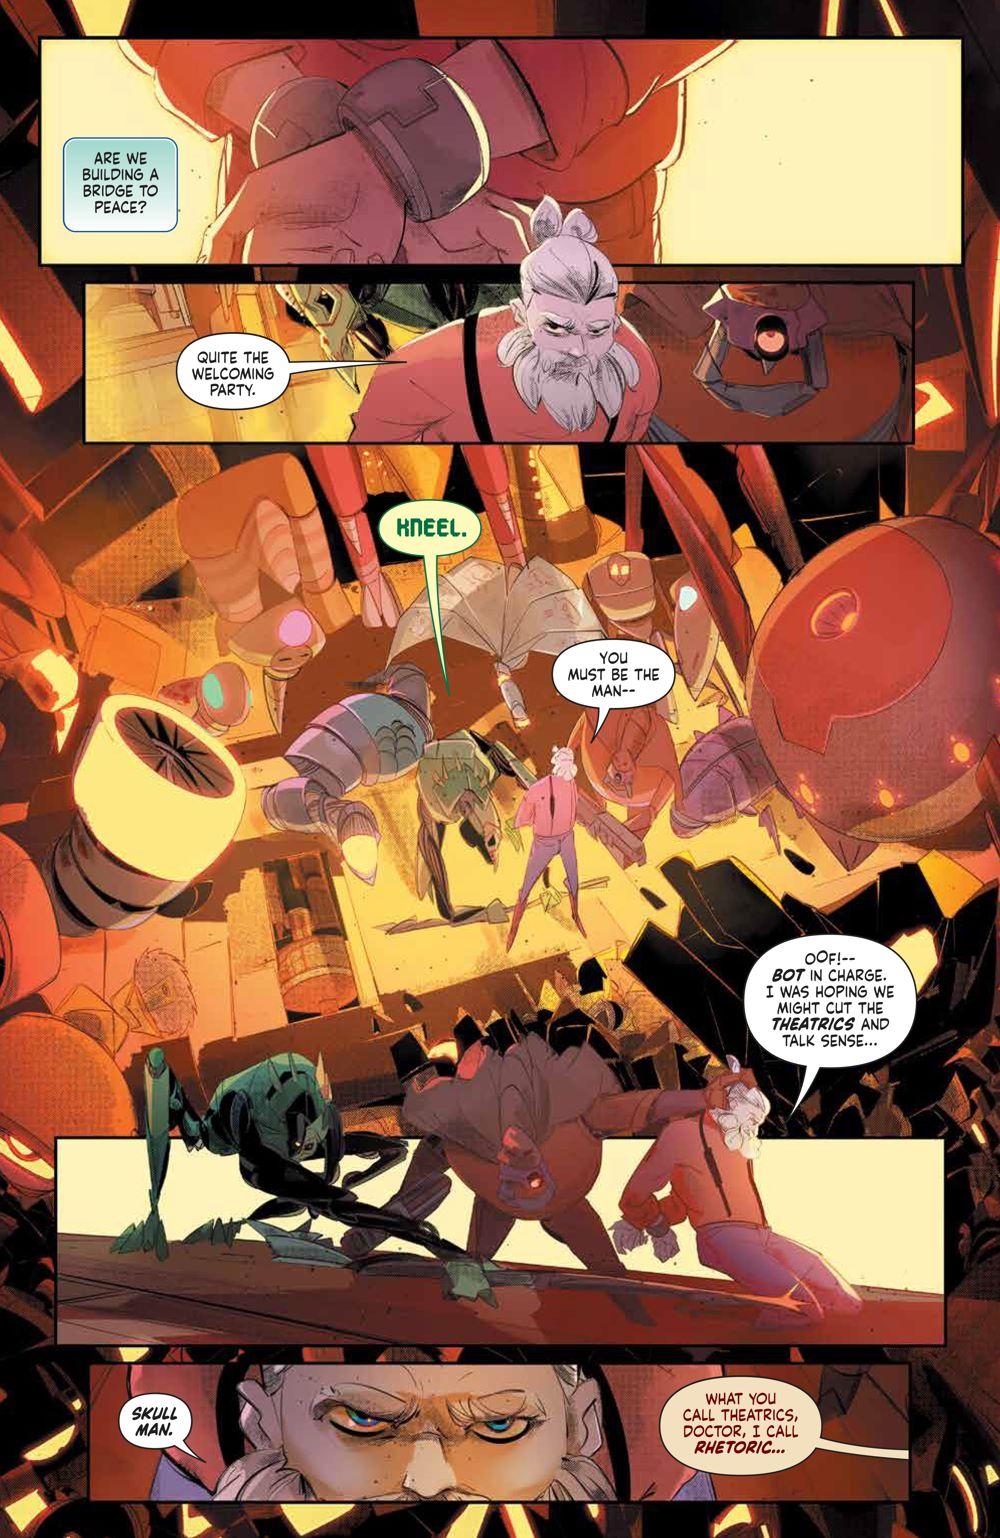 MegaMan_FullyCharged_001_PRESS_7 ComicList Previews: MEGA MAN FULLY CHARGED #1